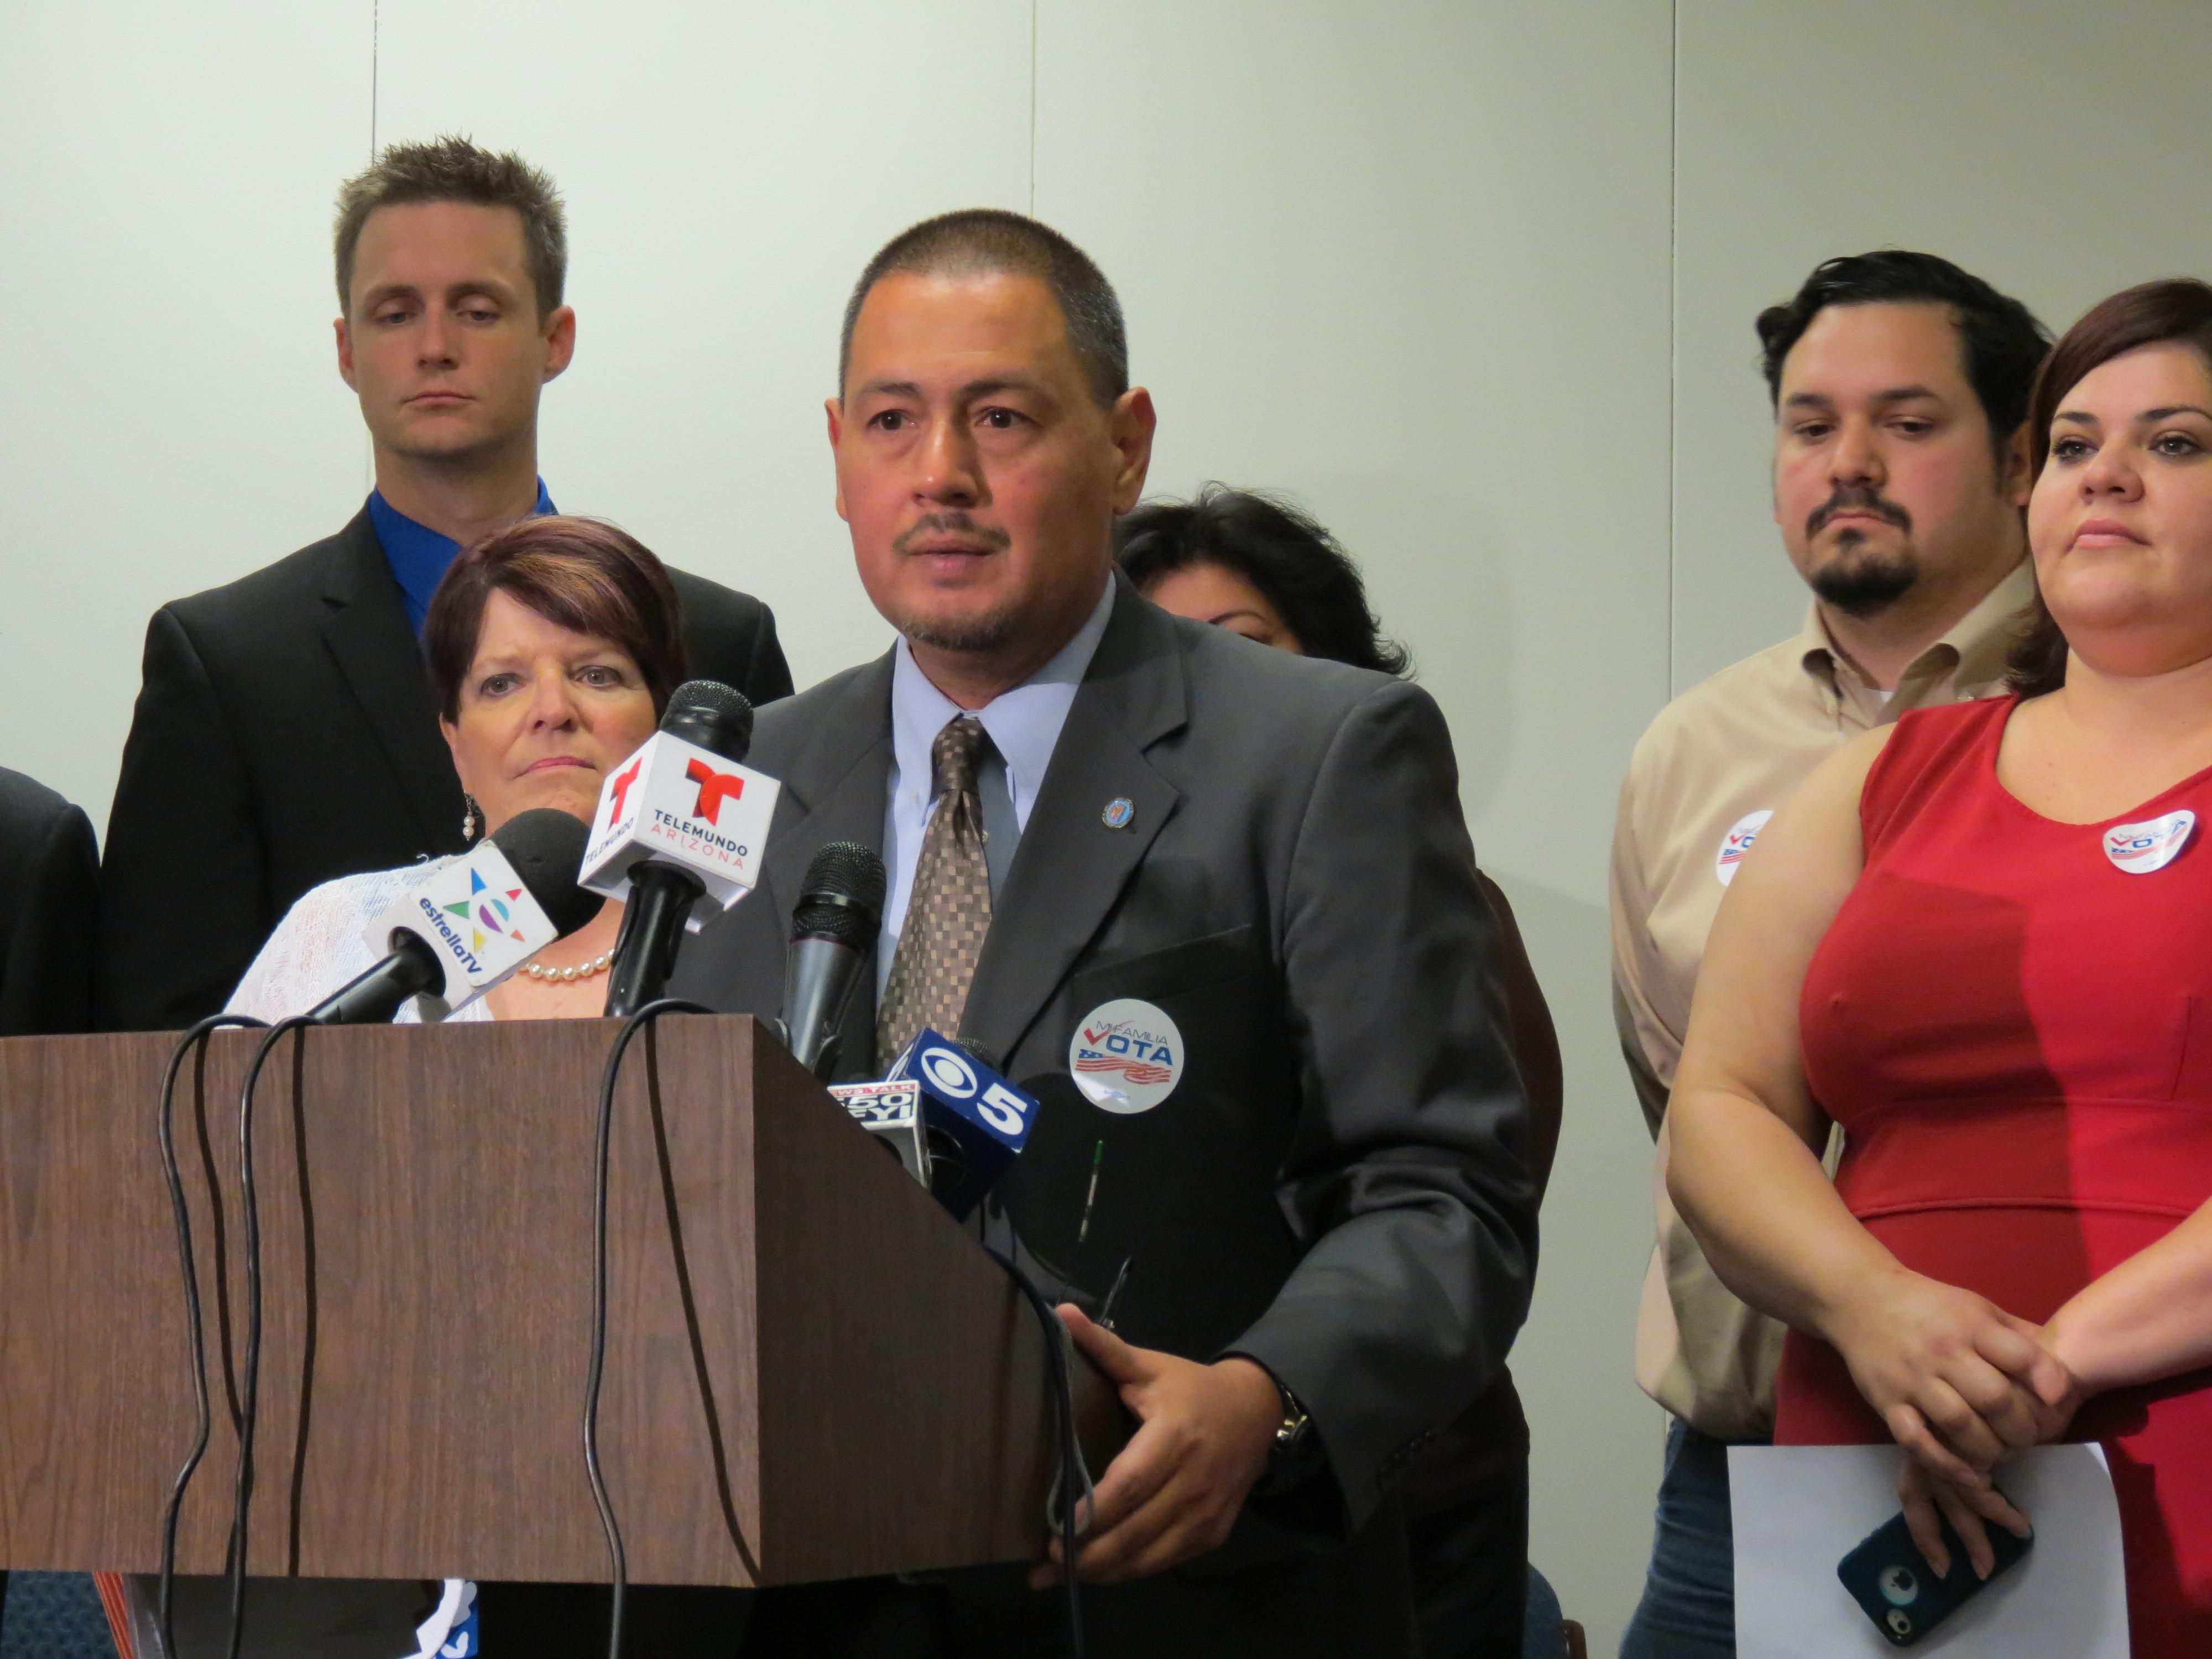 State Sen. Steve Gallardo